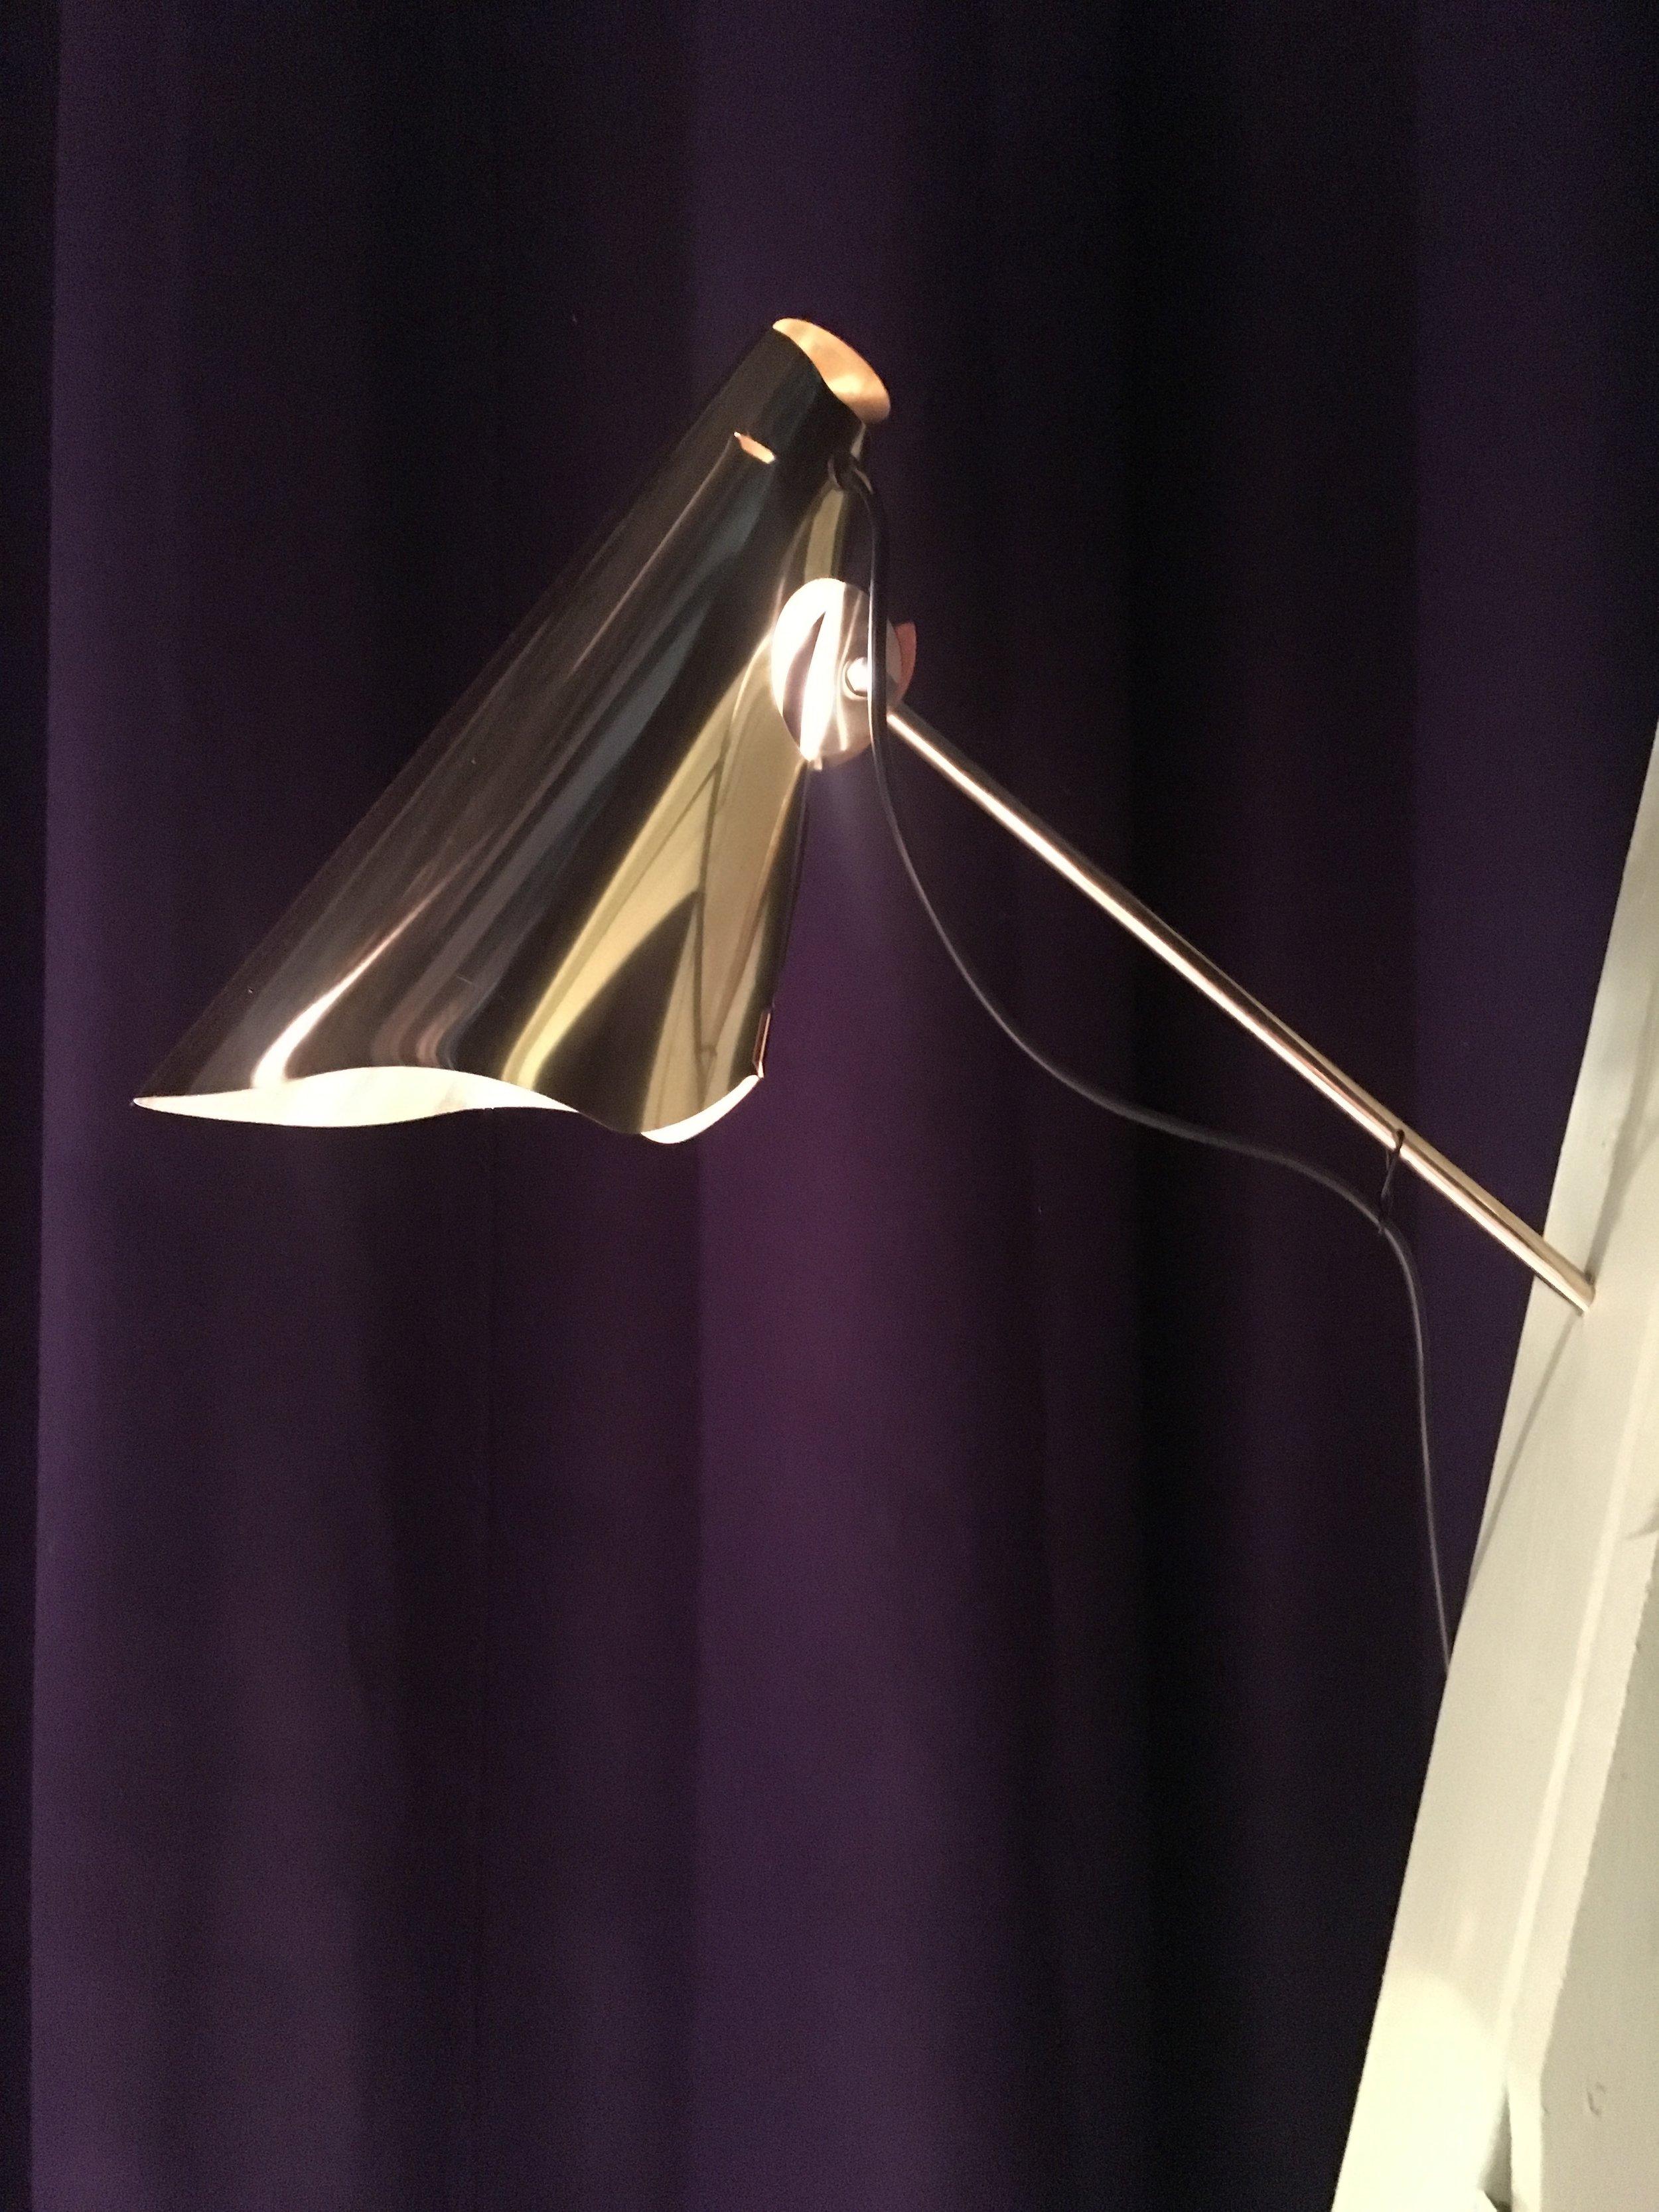 Wall Lamp - Brass, Ipé WoodCurrent ProductionLarge Screen: 50 x 35 x 25 cmX-Large Screen: 65 x 40 x 35 cmPrice upon request